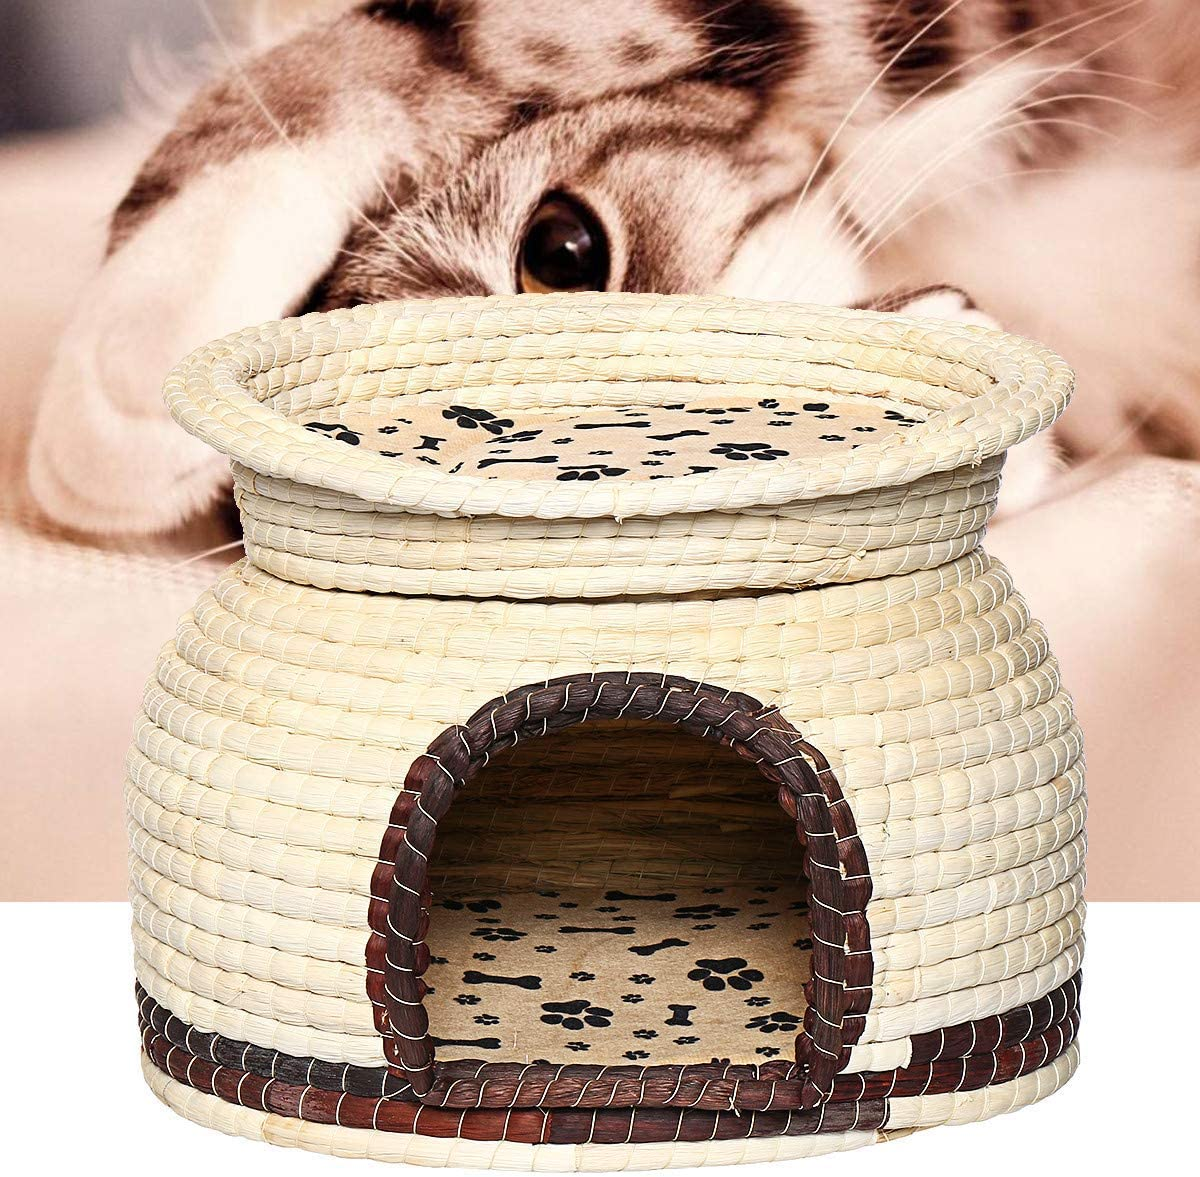 Terrarum - Cesta de Doble Uso para Mascotas, Perros, Gatos, Camas Suaves, caseta para Cachorros: Amazon.es: Jardín